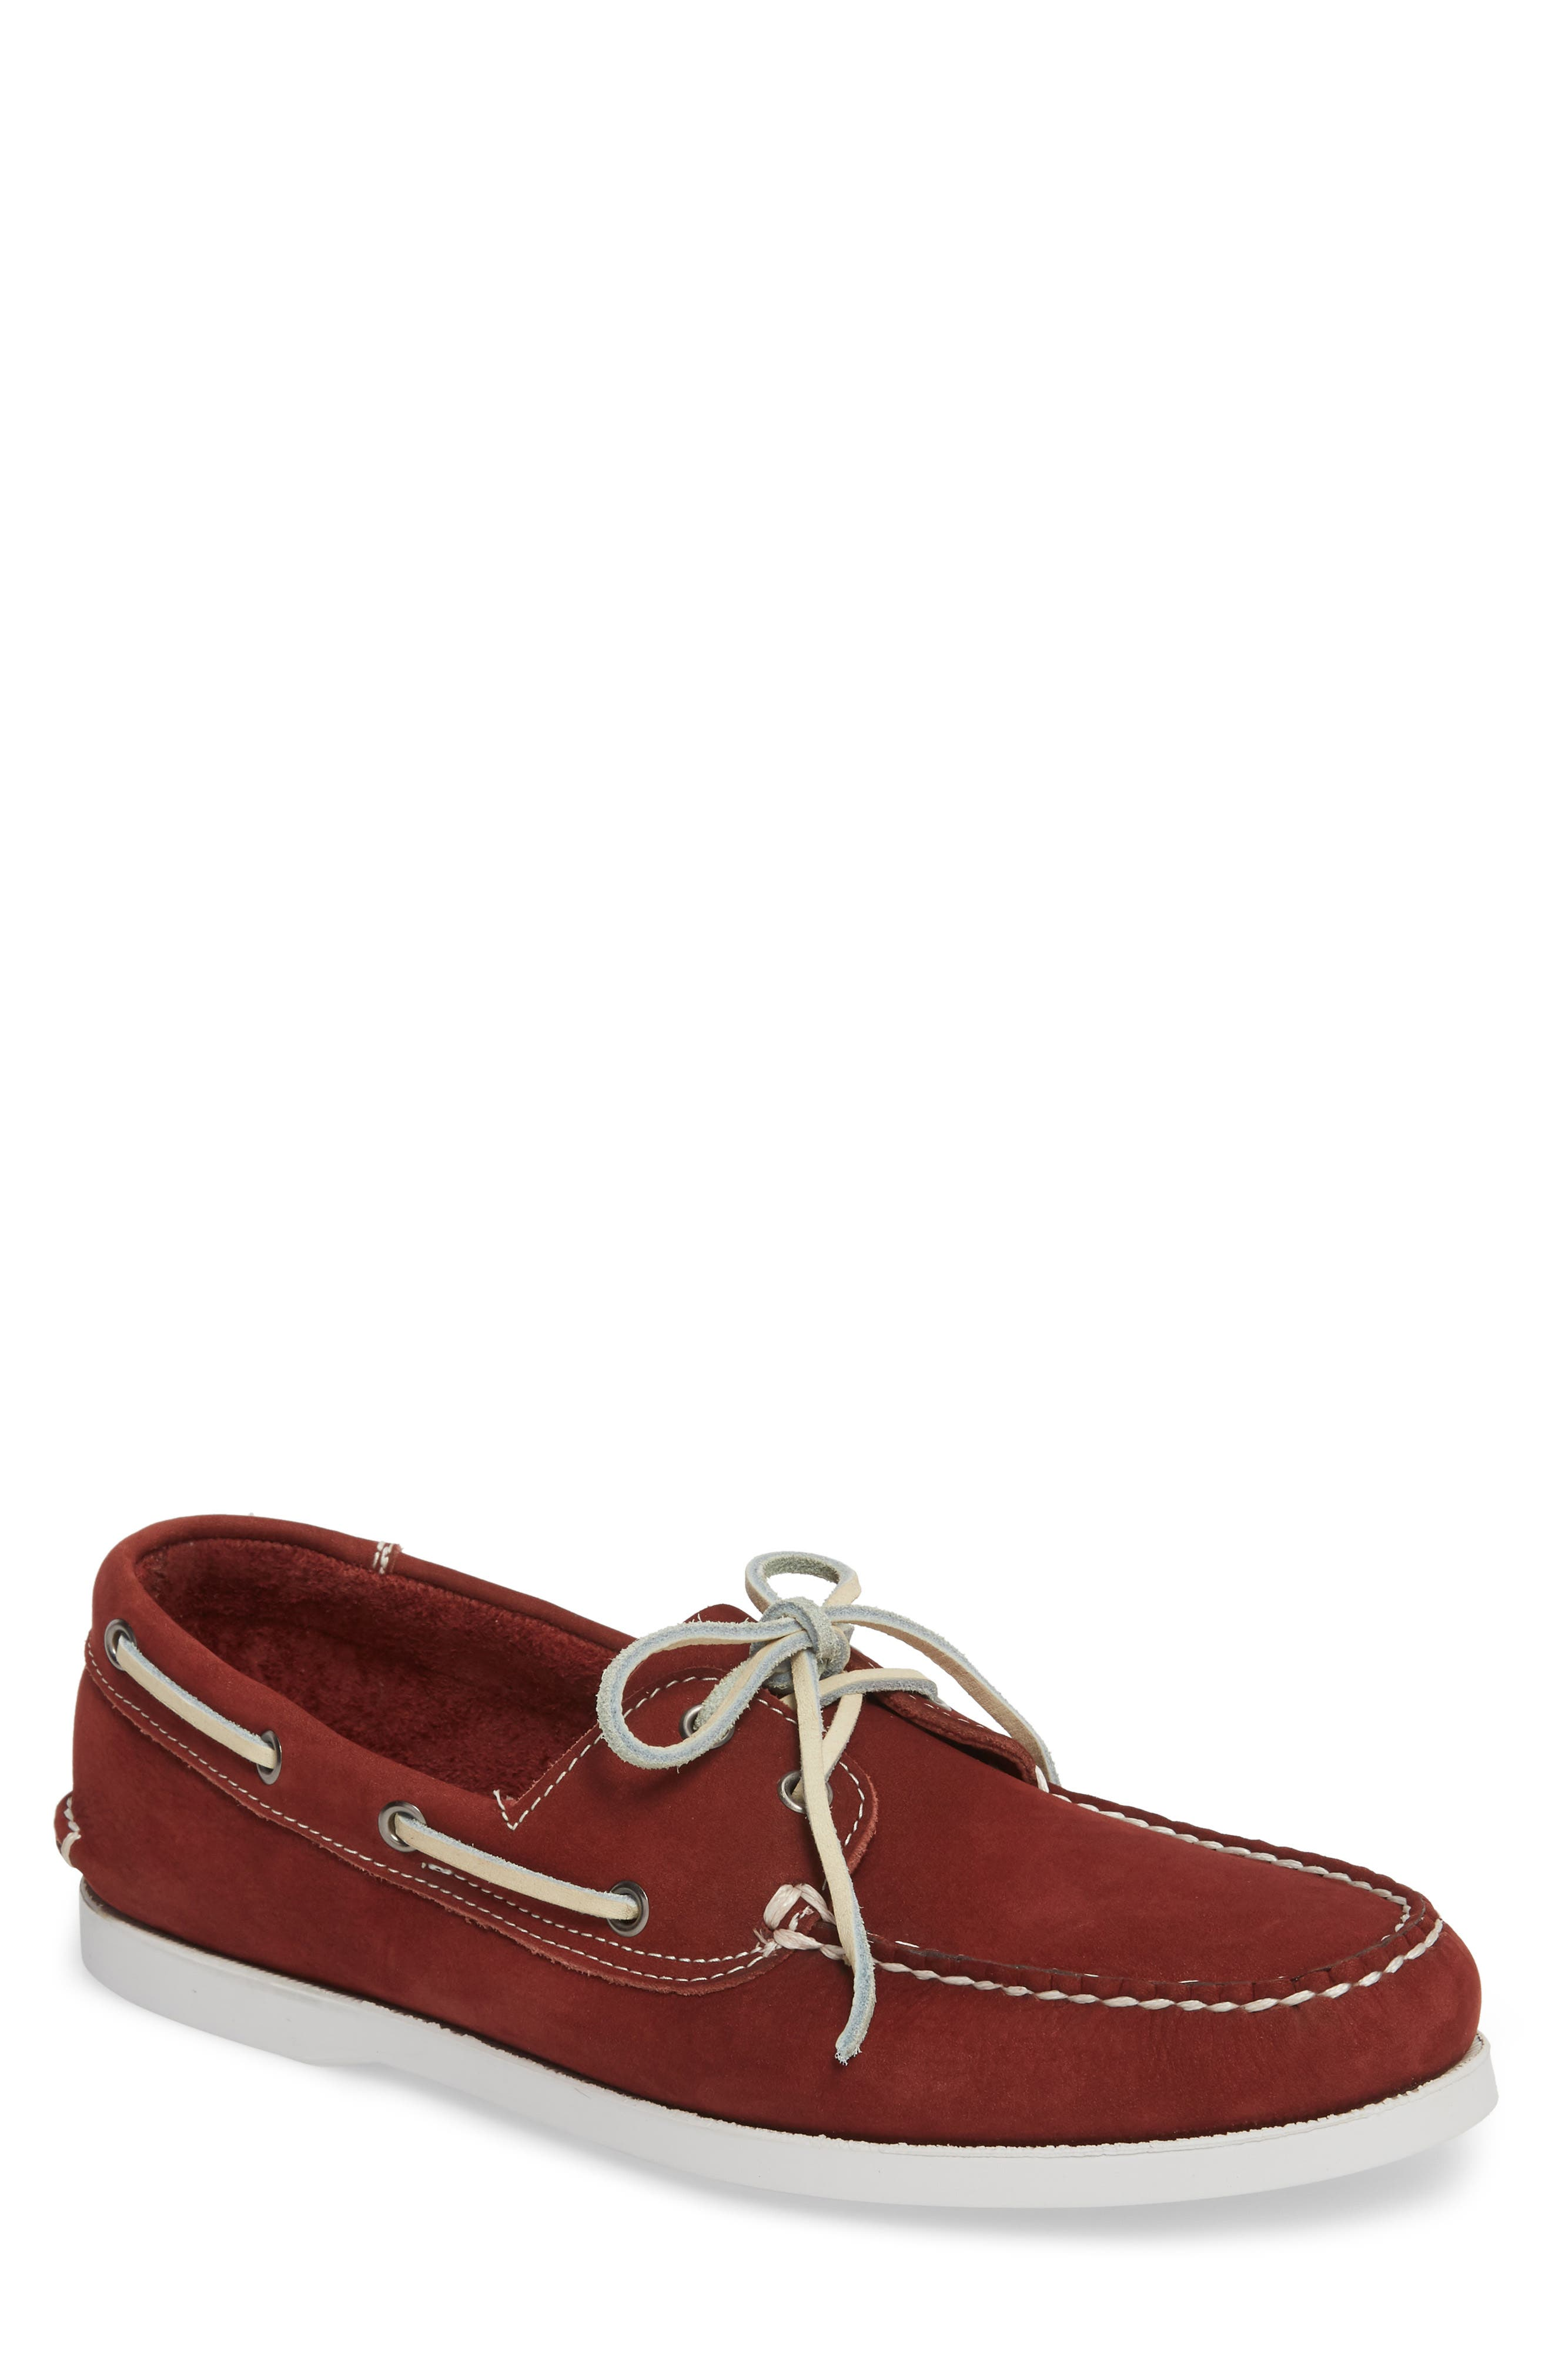 rockport shoes stores locations 90201 lyrics 963161